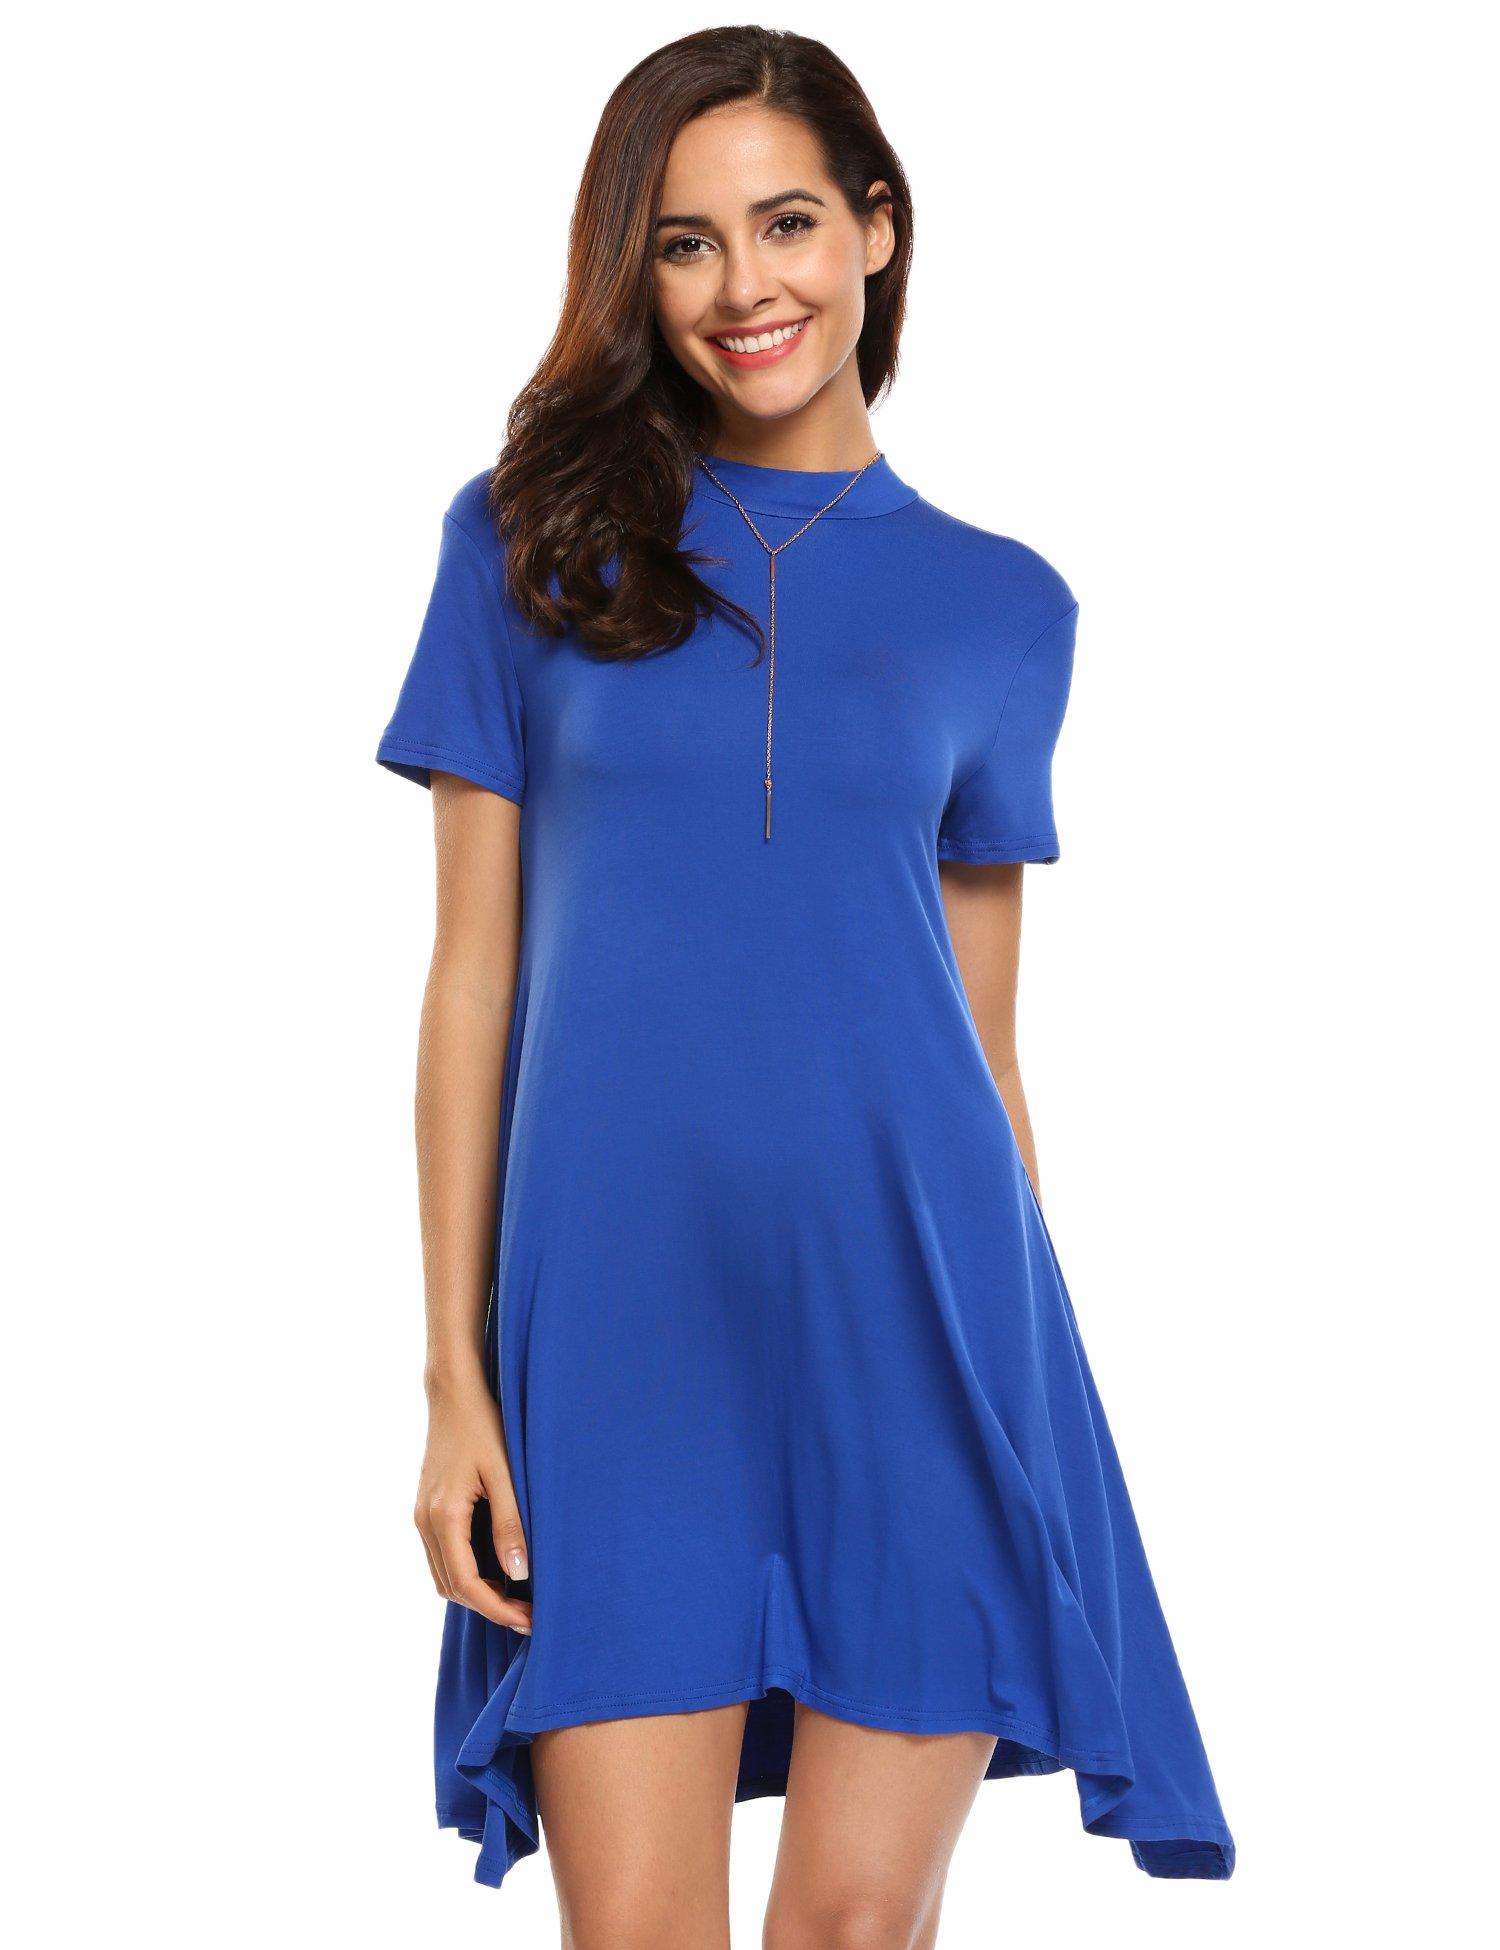 Available at Amazon: Beyove Women Casual Long Sleeve Handkerchief Hem Striped Tunic Loose T Shirt Dress